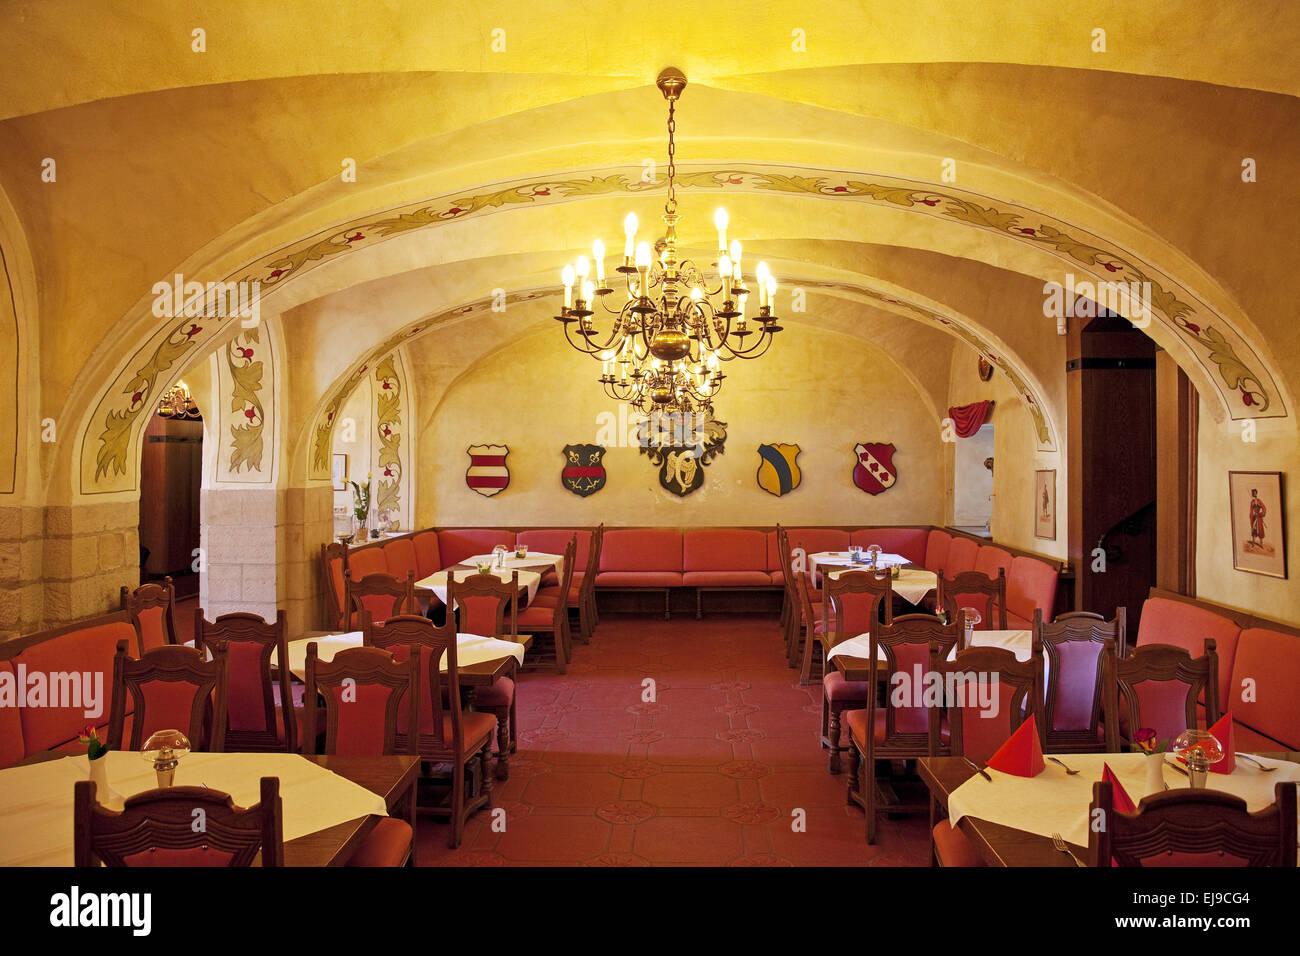 Restaurant Burg Huelshoff, Havixbeck, Germany - Stock Image